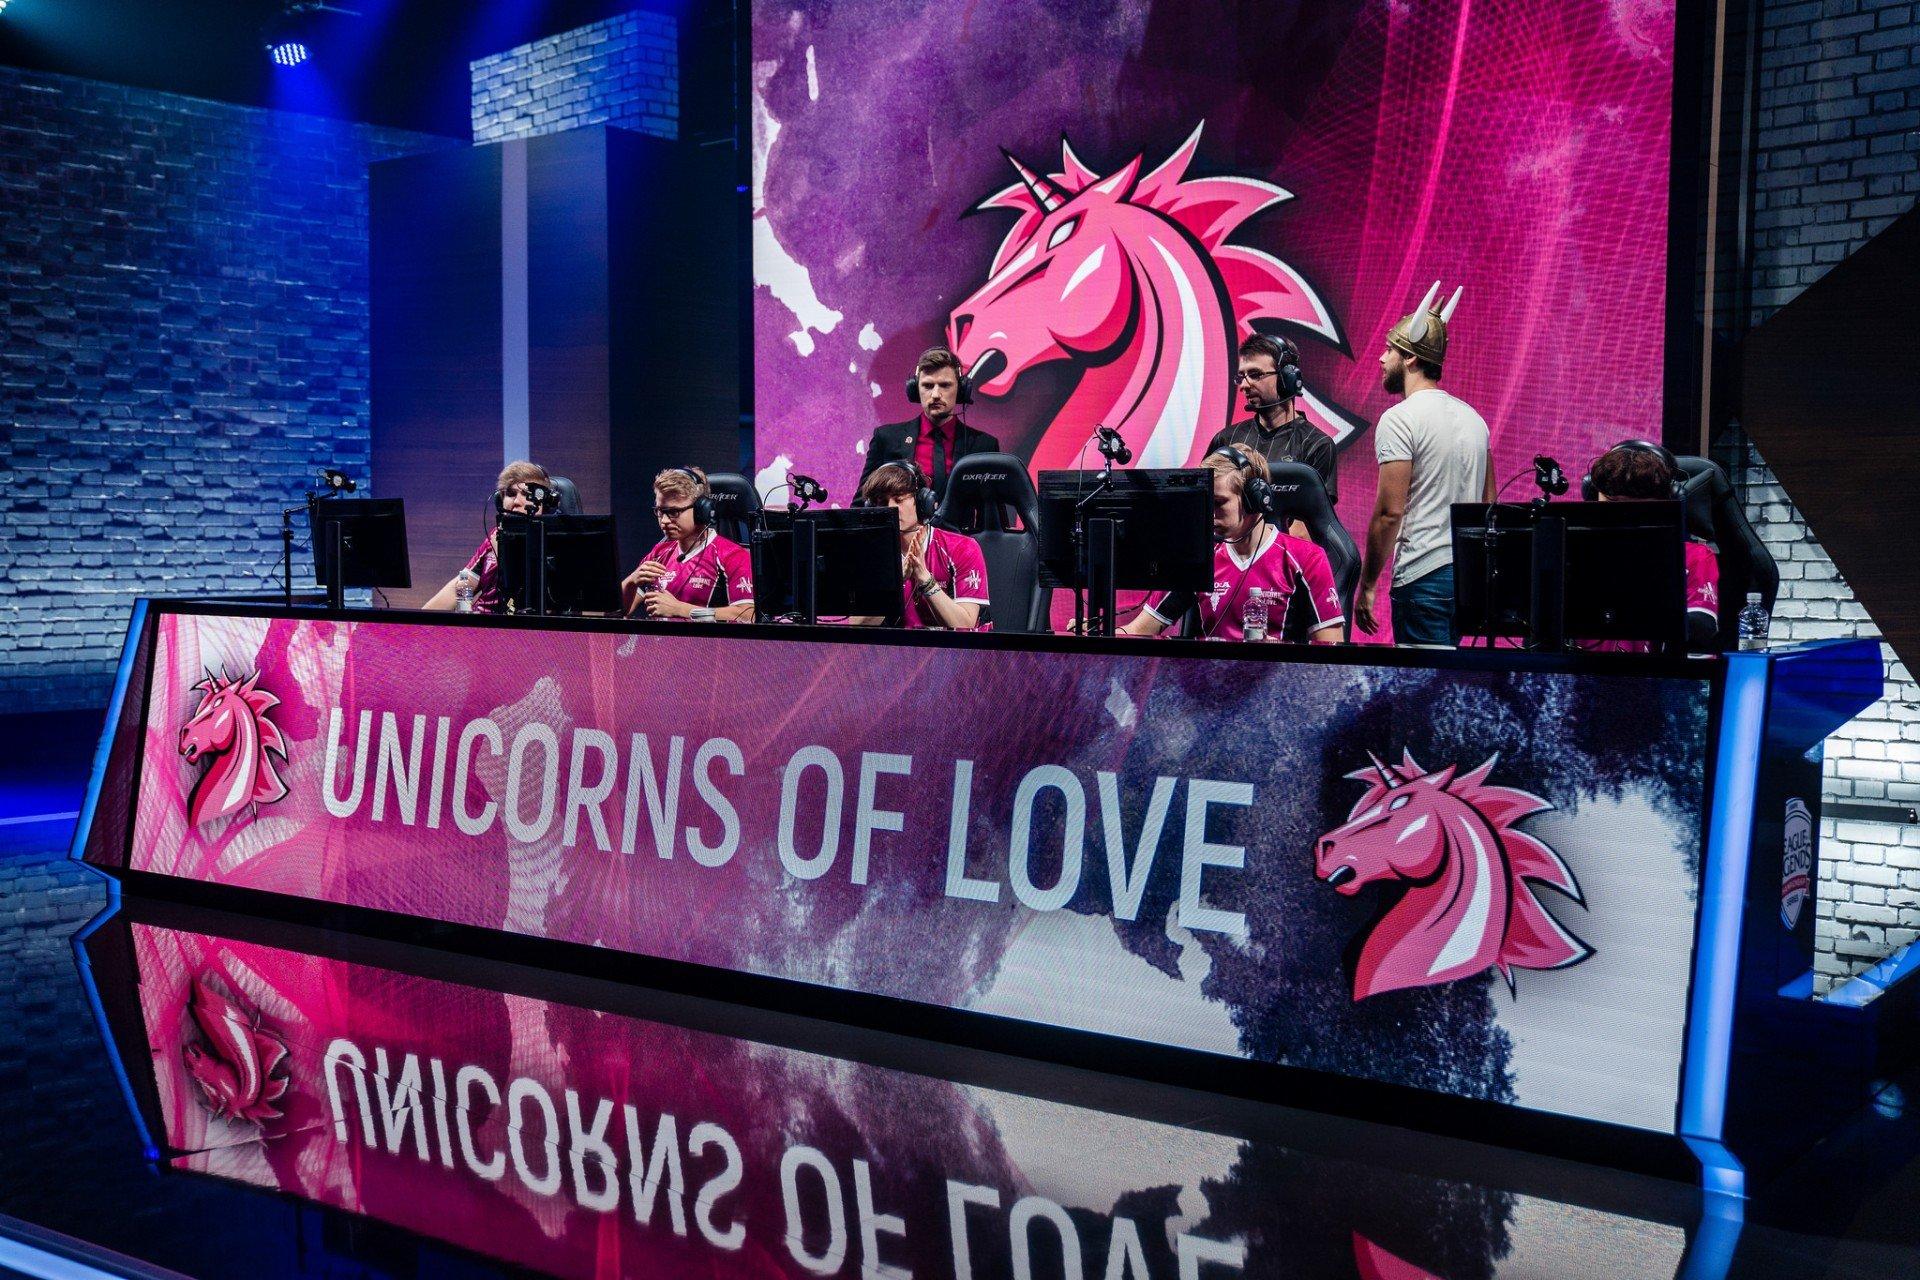 Unicorns of Love выиграла у Gambit в дебютном матче LCL 2021